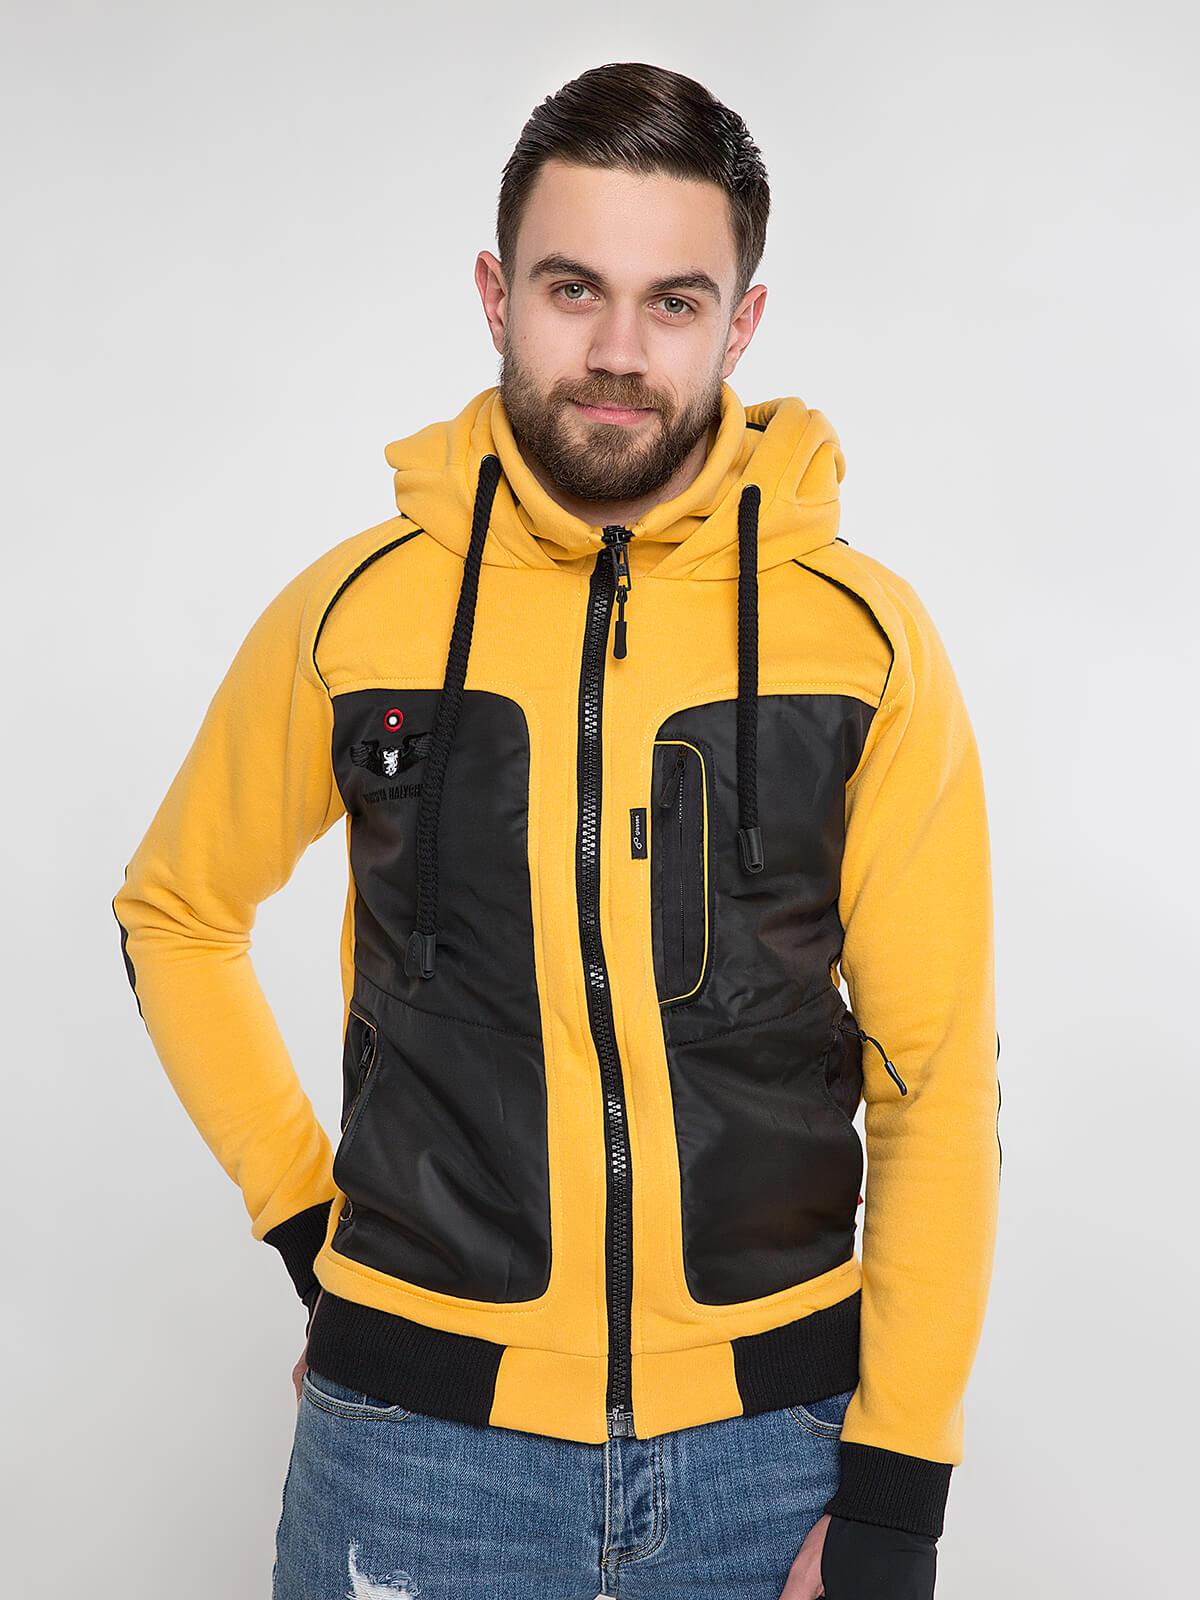 Men's Hoodie Syla. Color yellow. Unisex hoodie (men's sizes).